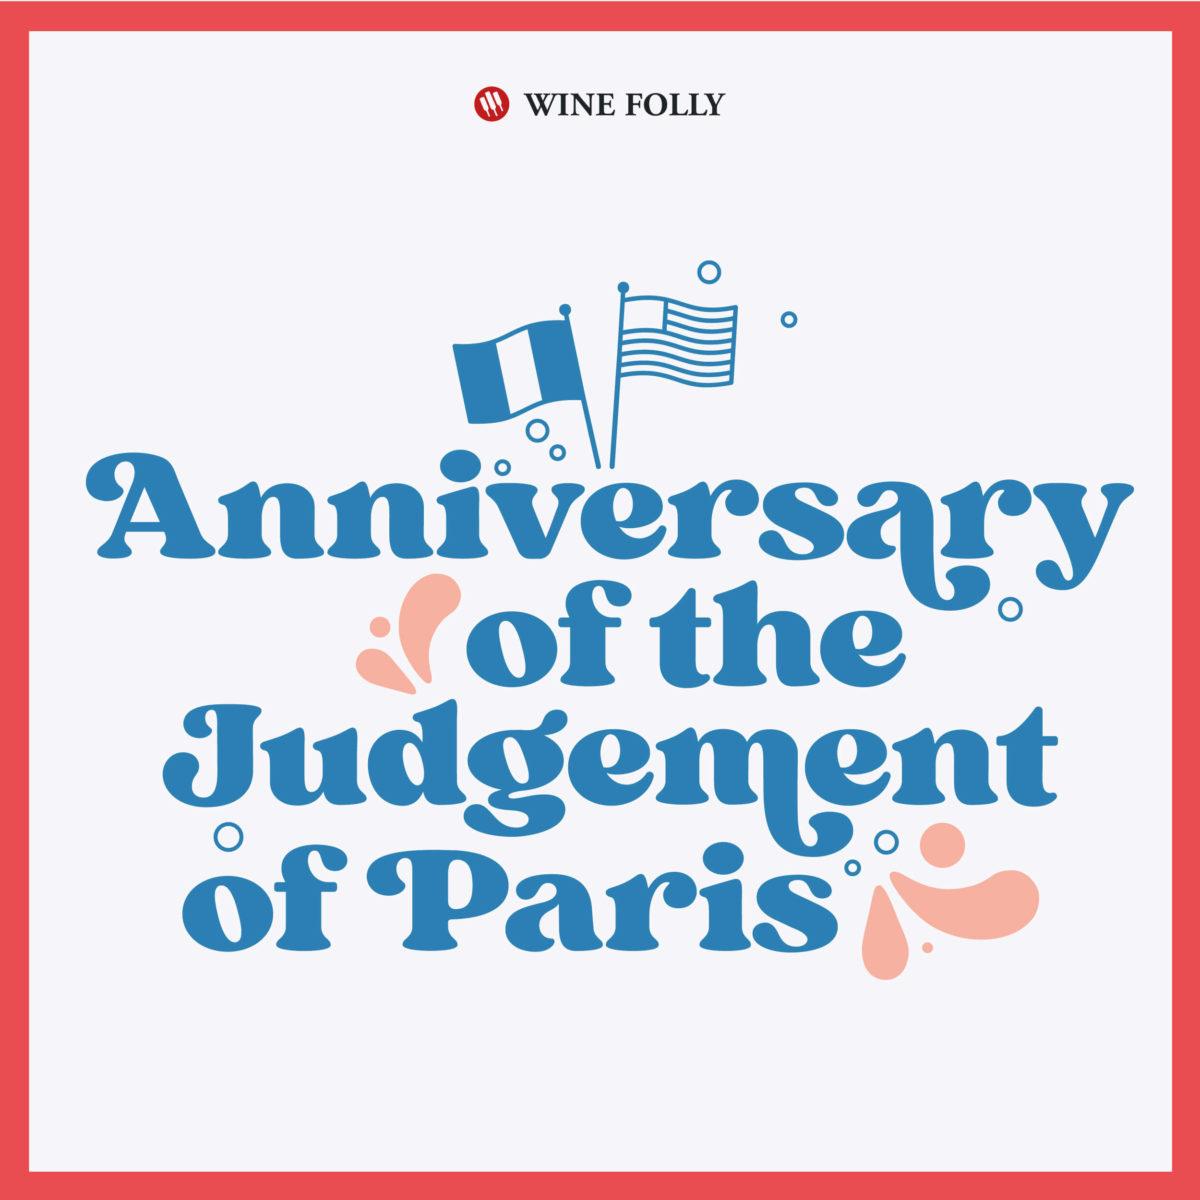 wine-holidays-anniversary-judgement-paris